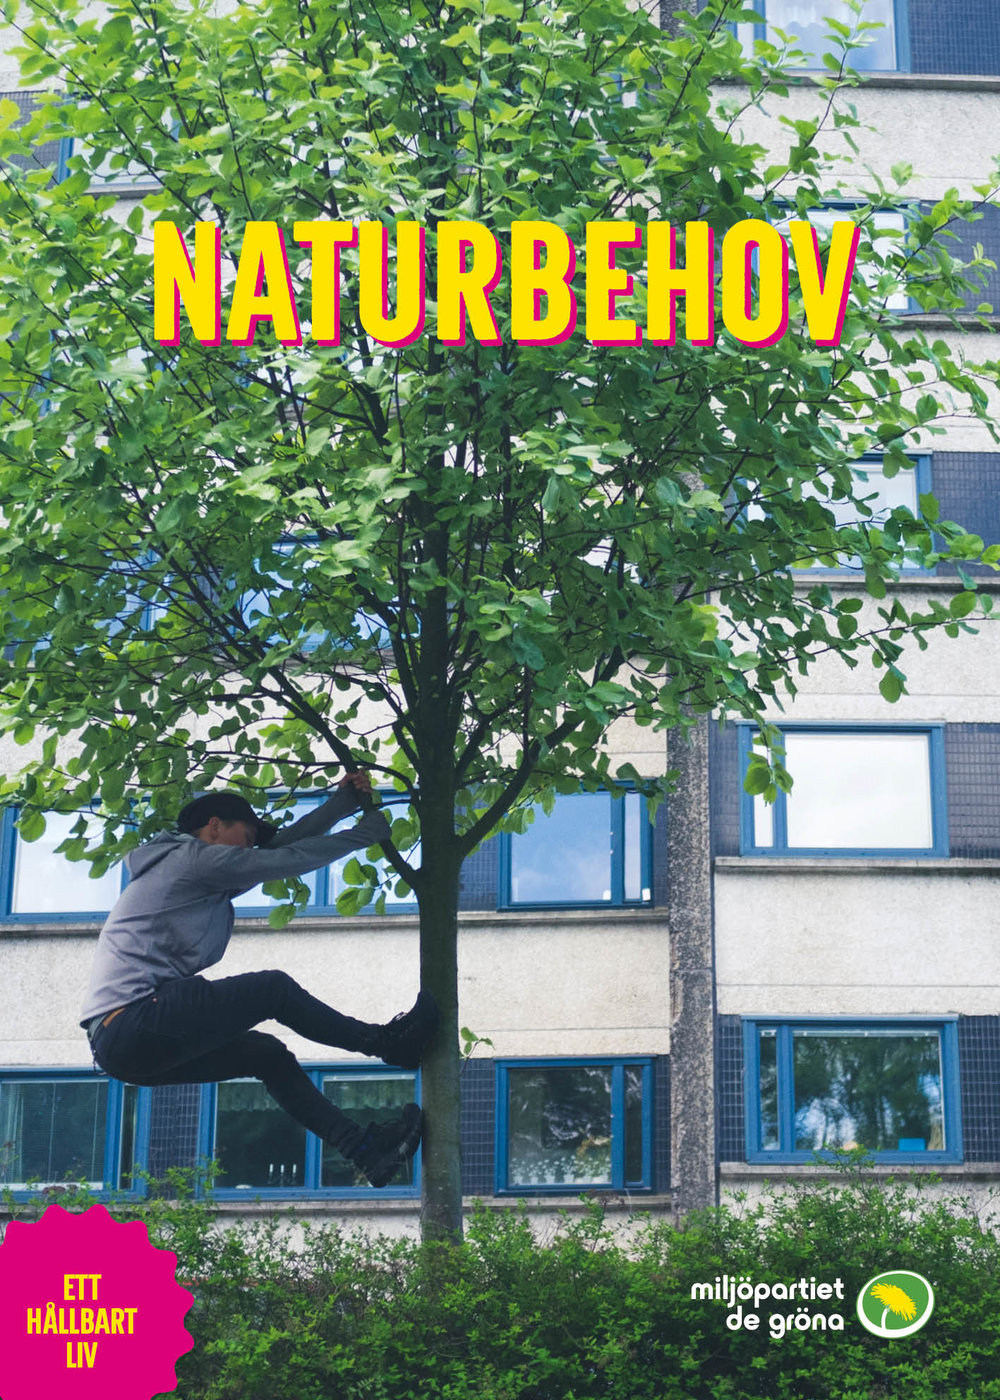 Naturbehov_Print_KR3.jpg